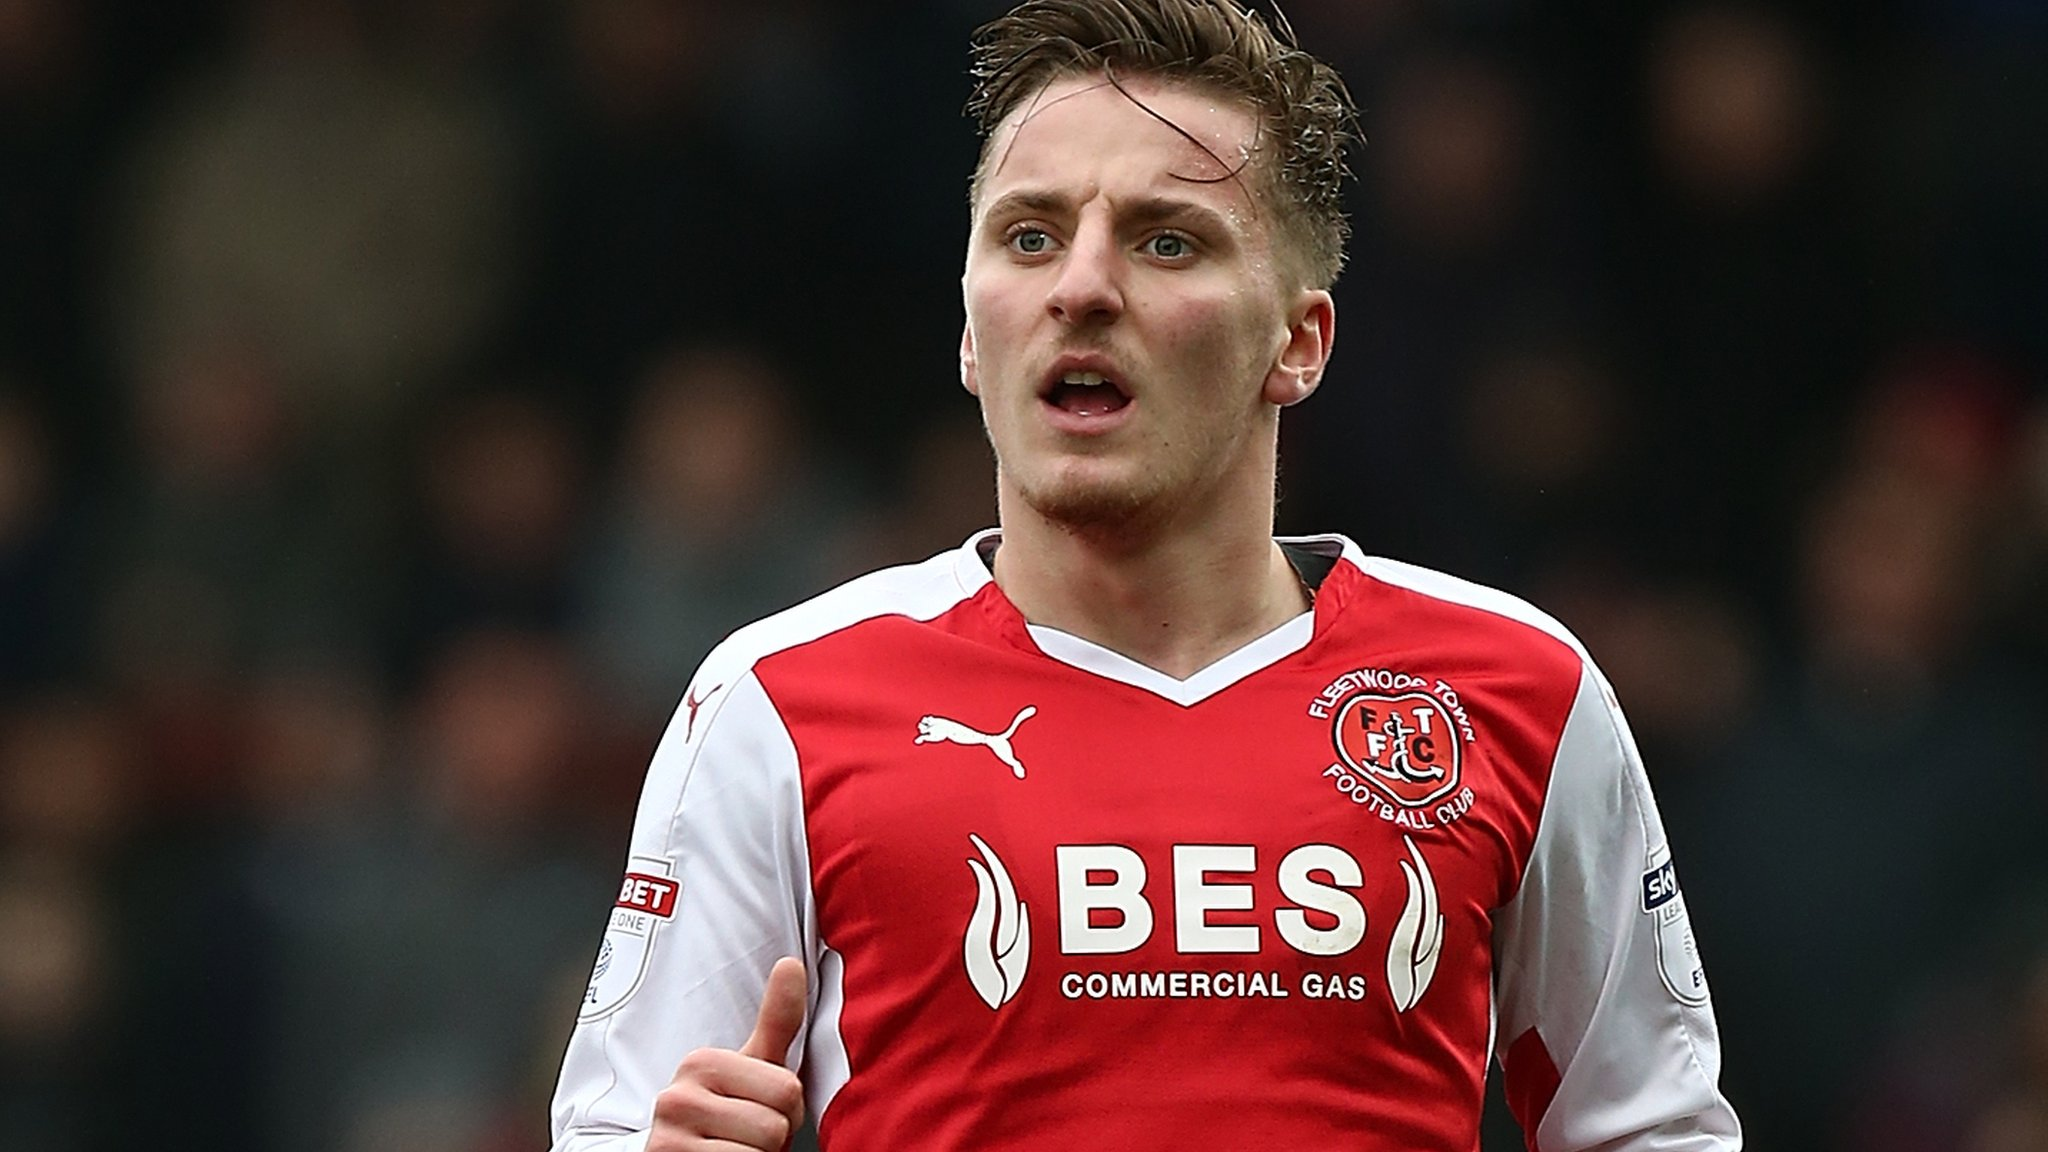 George Glendon: Carlisle United sign Fleetwood Town midfielder